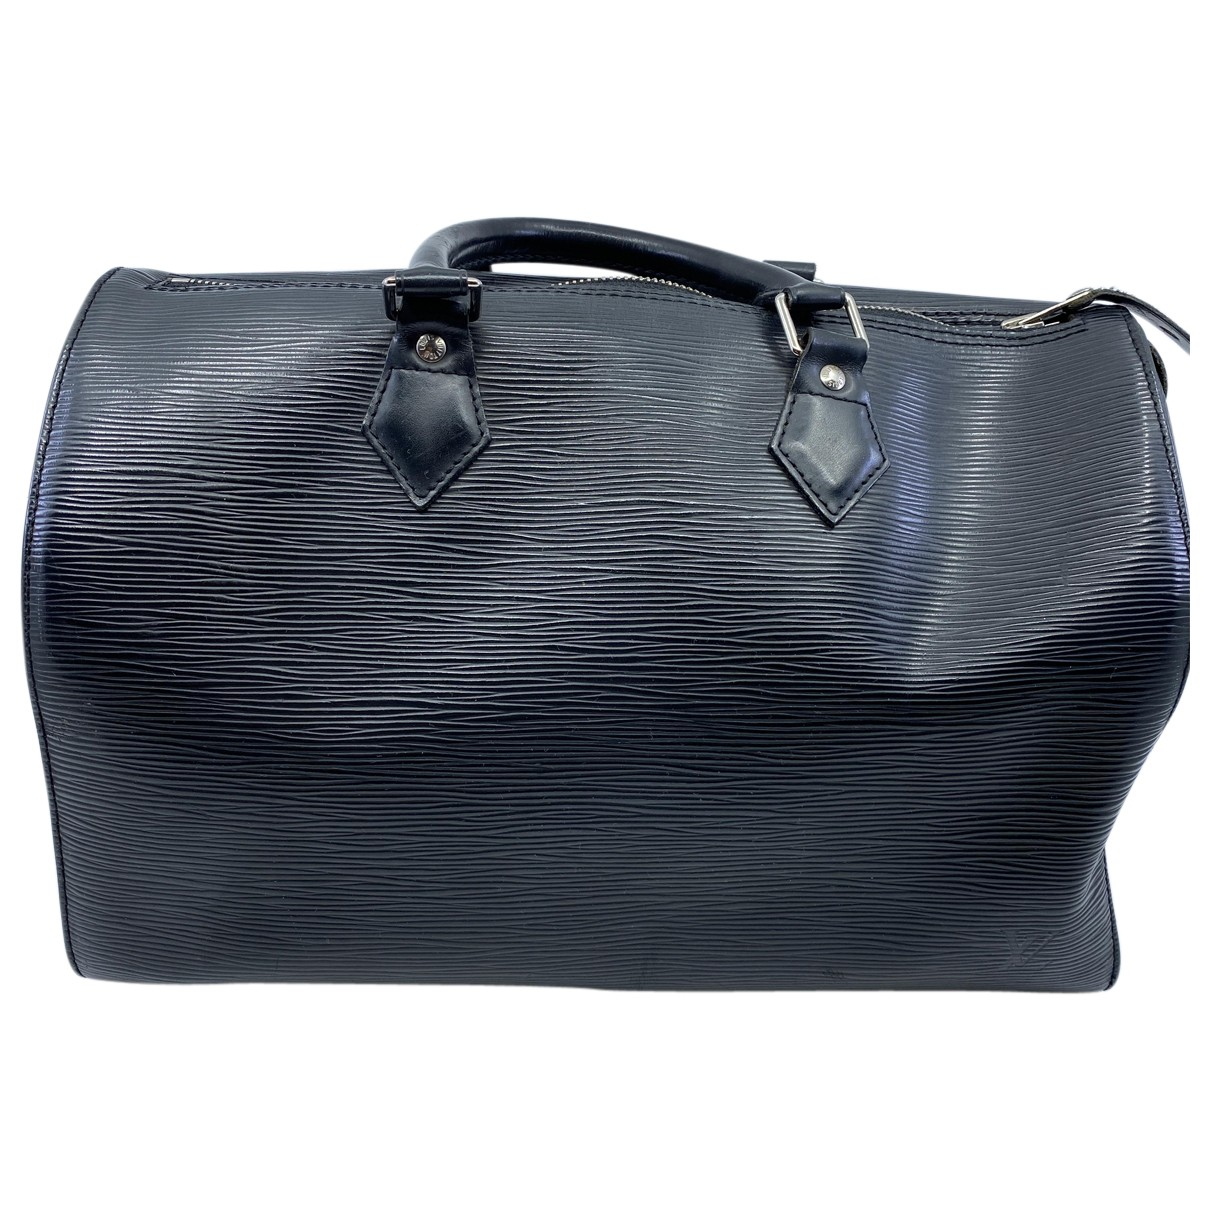 Louis Vuitton Speedy Black Leather handbag for Women N